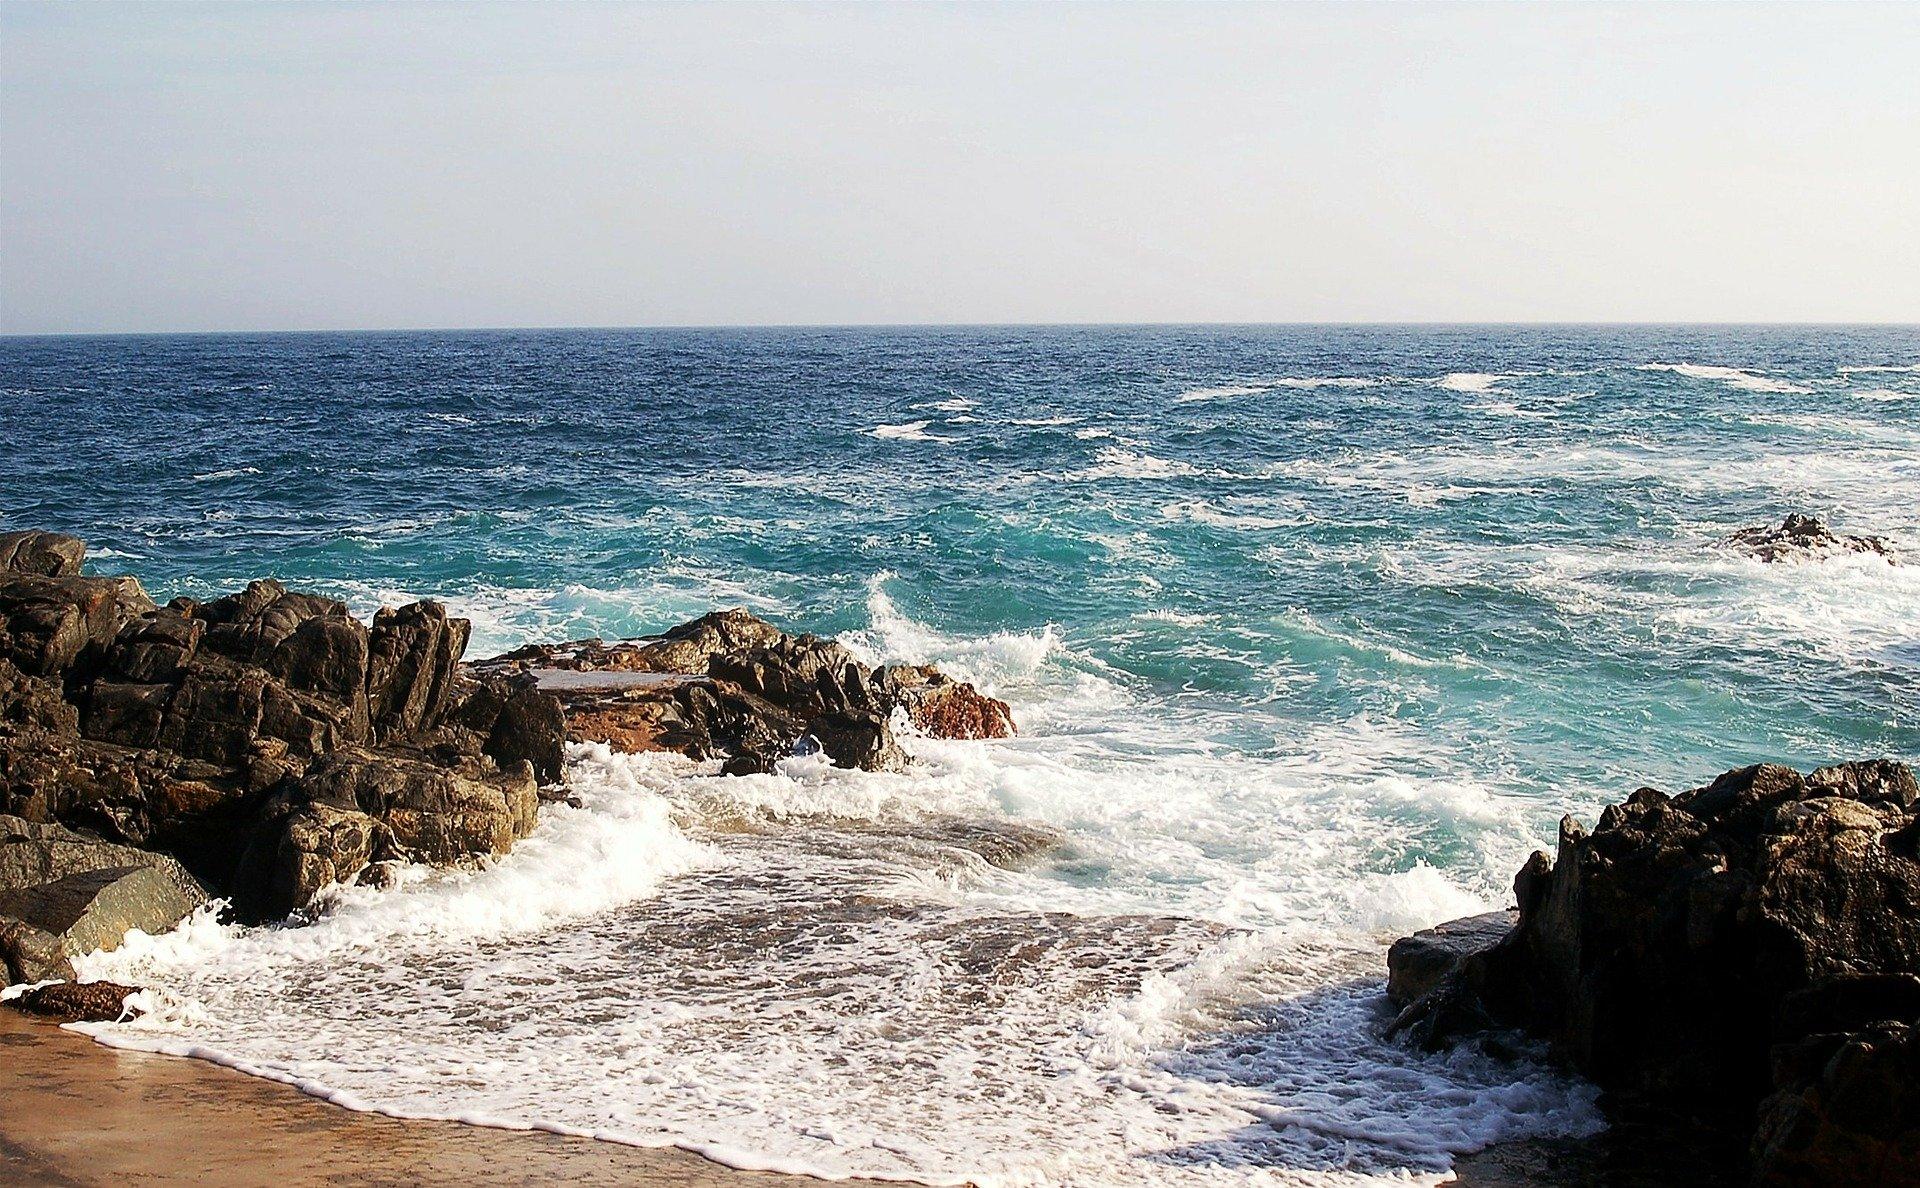 Costa Brava - Seguir Viajando Agencia de Viajes